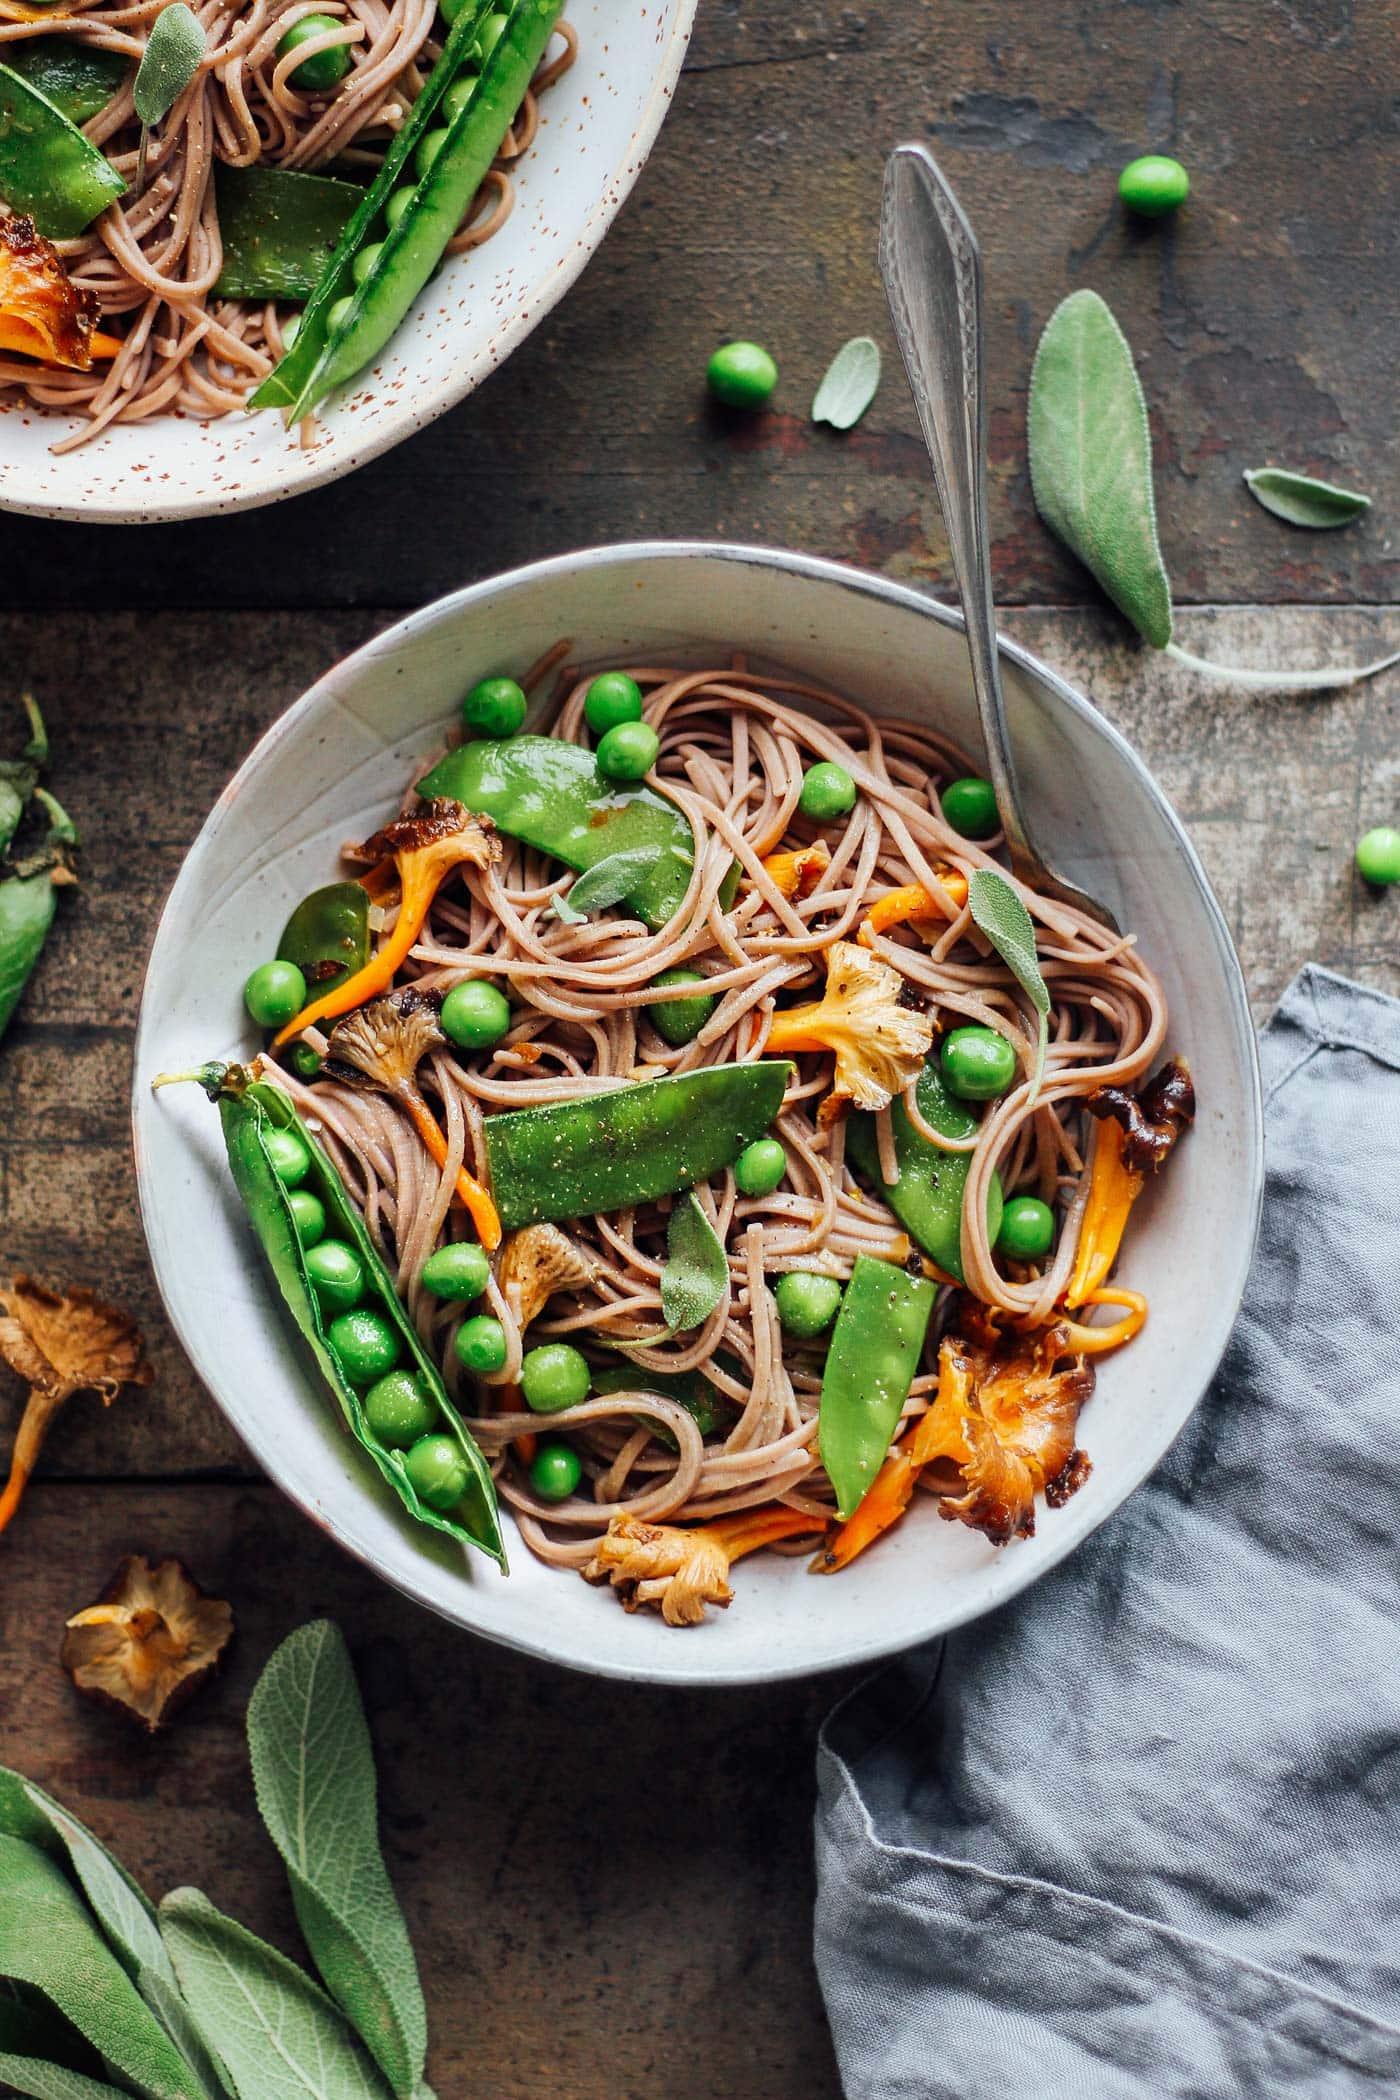 Snow Pea & Chanterelle Soba Noodles